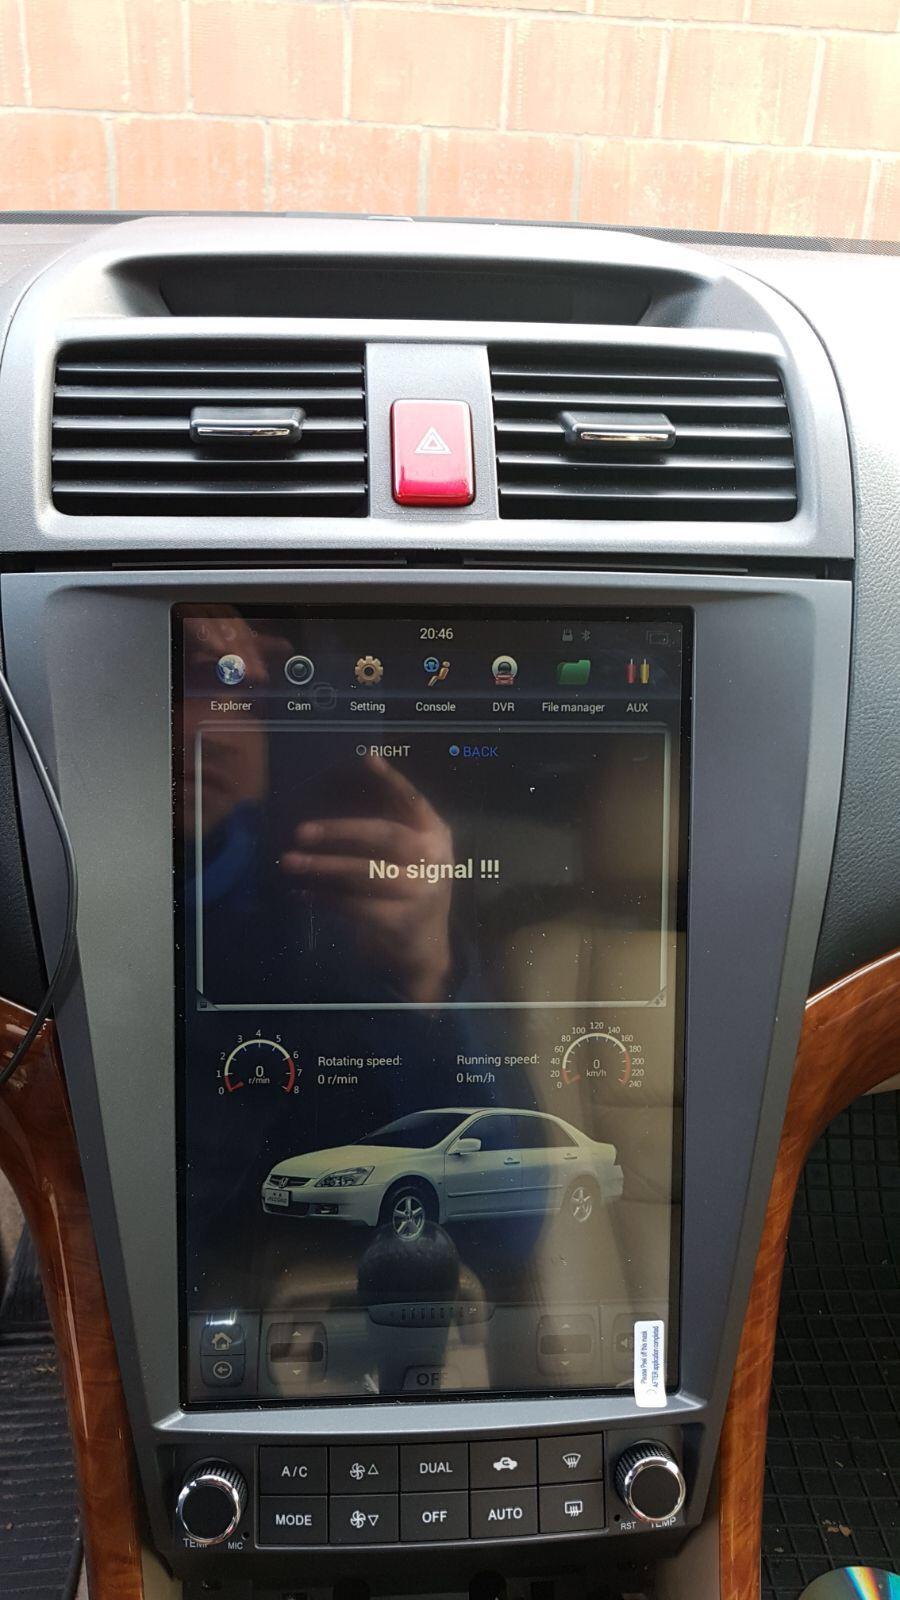 Tesla Vertical Screen Car Dvd Gps Player Car Radio Navigation System For Honda Accord 2003 2007 Www Navihua Com Whatsapp Car Radio Car Videos Car Dvd Players